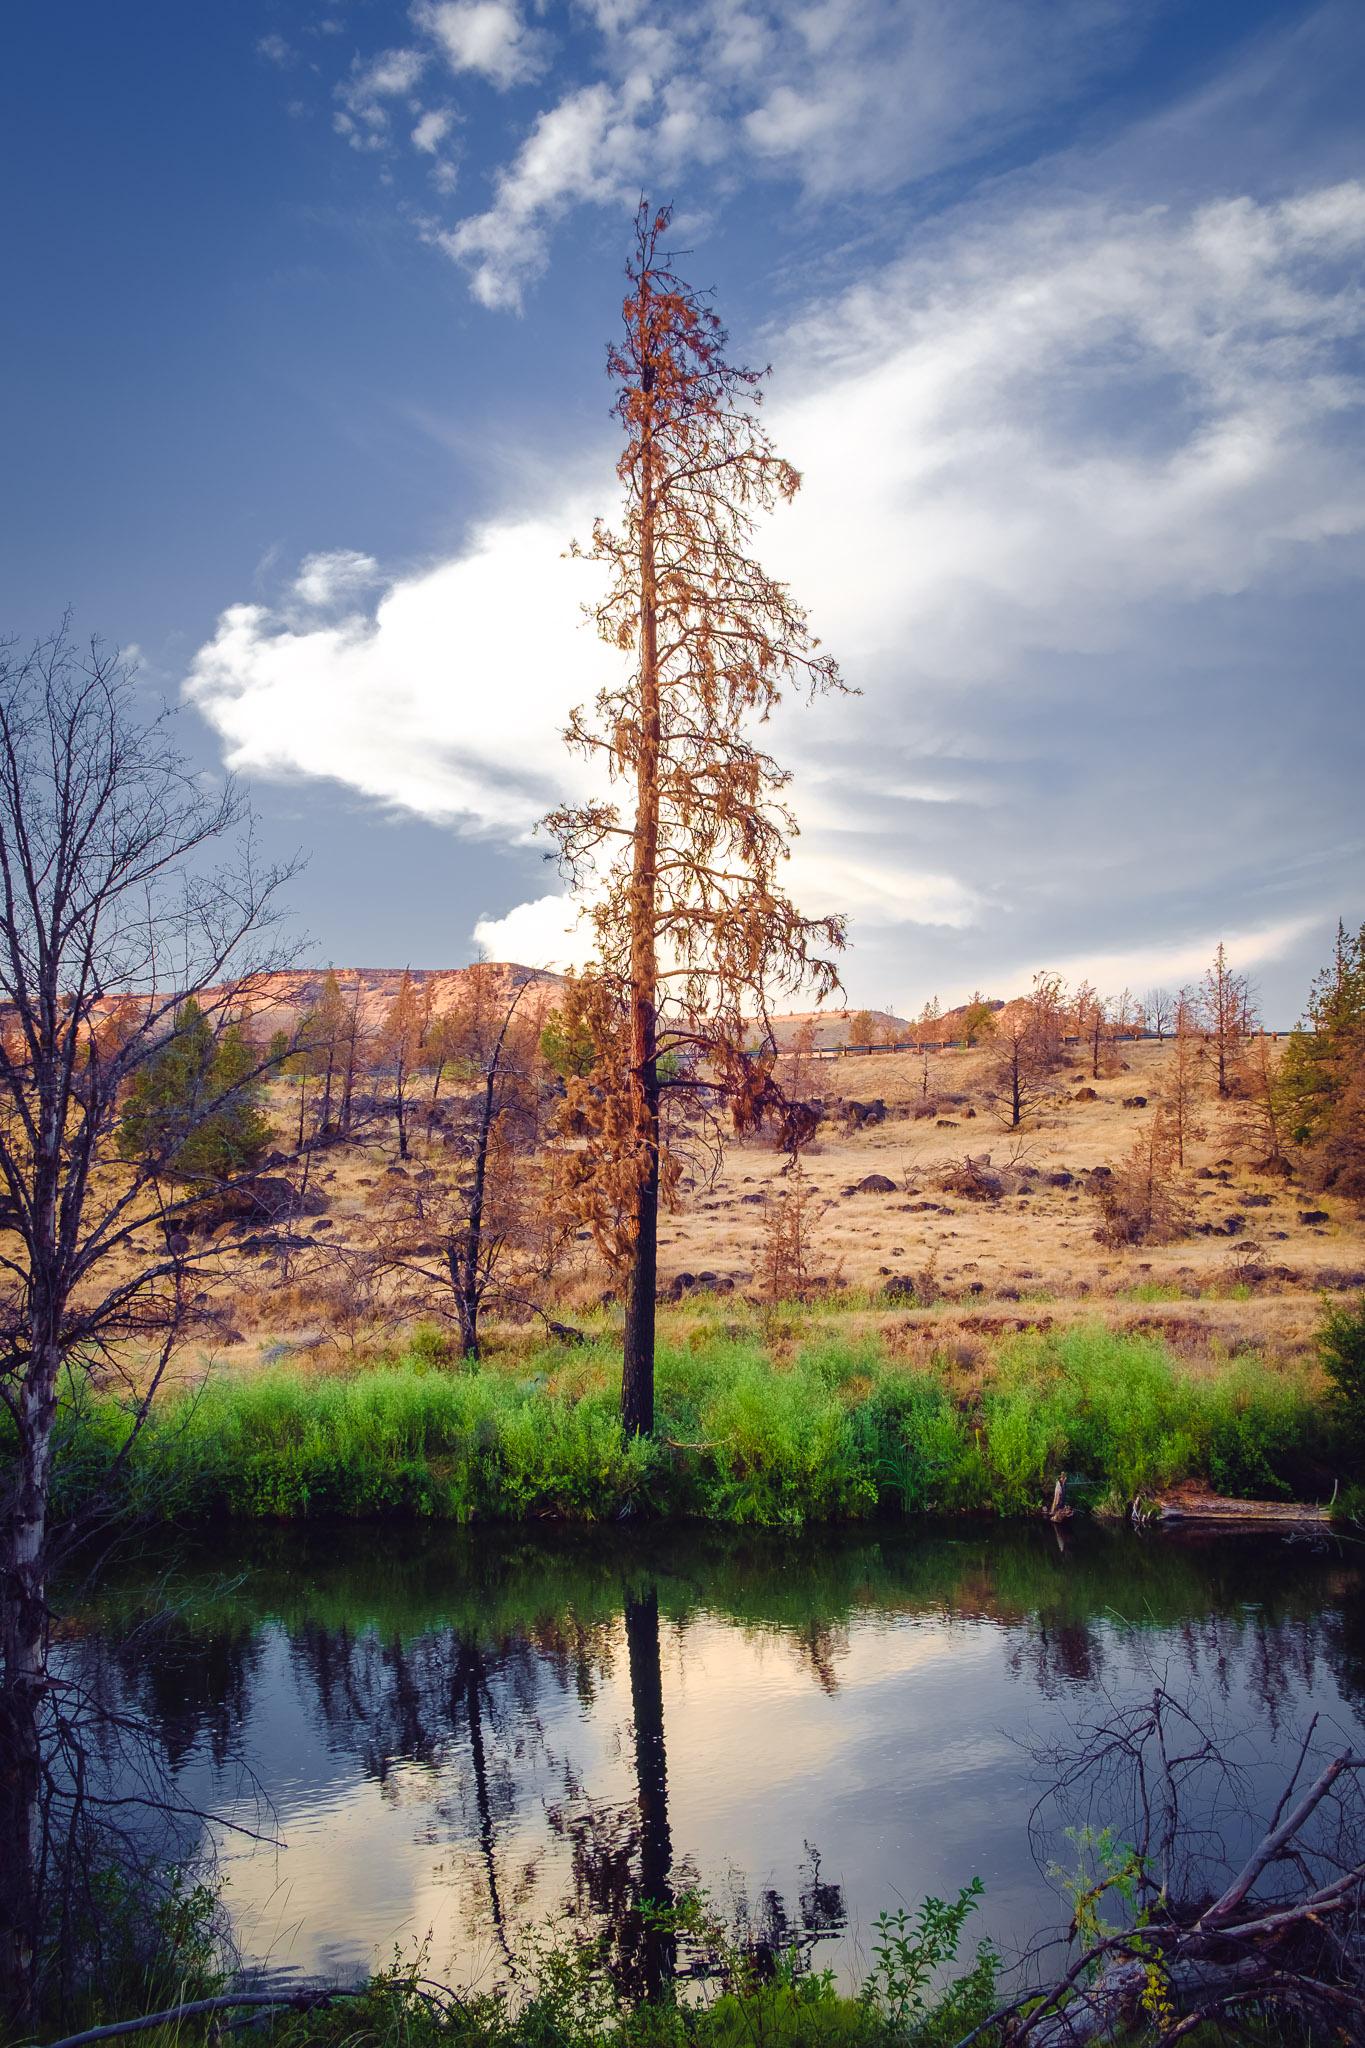 Fire Tree. Warm Springs, OR. Fujifilm XE-1, XF18-55mm @ 18mm, ISO 200, f/8, 1/30.